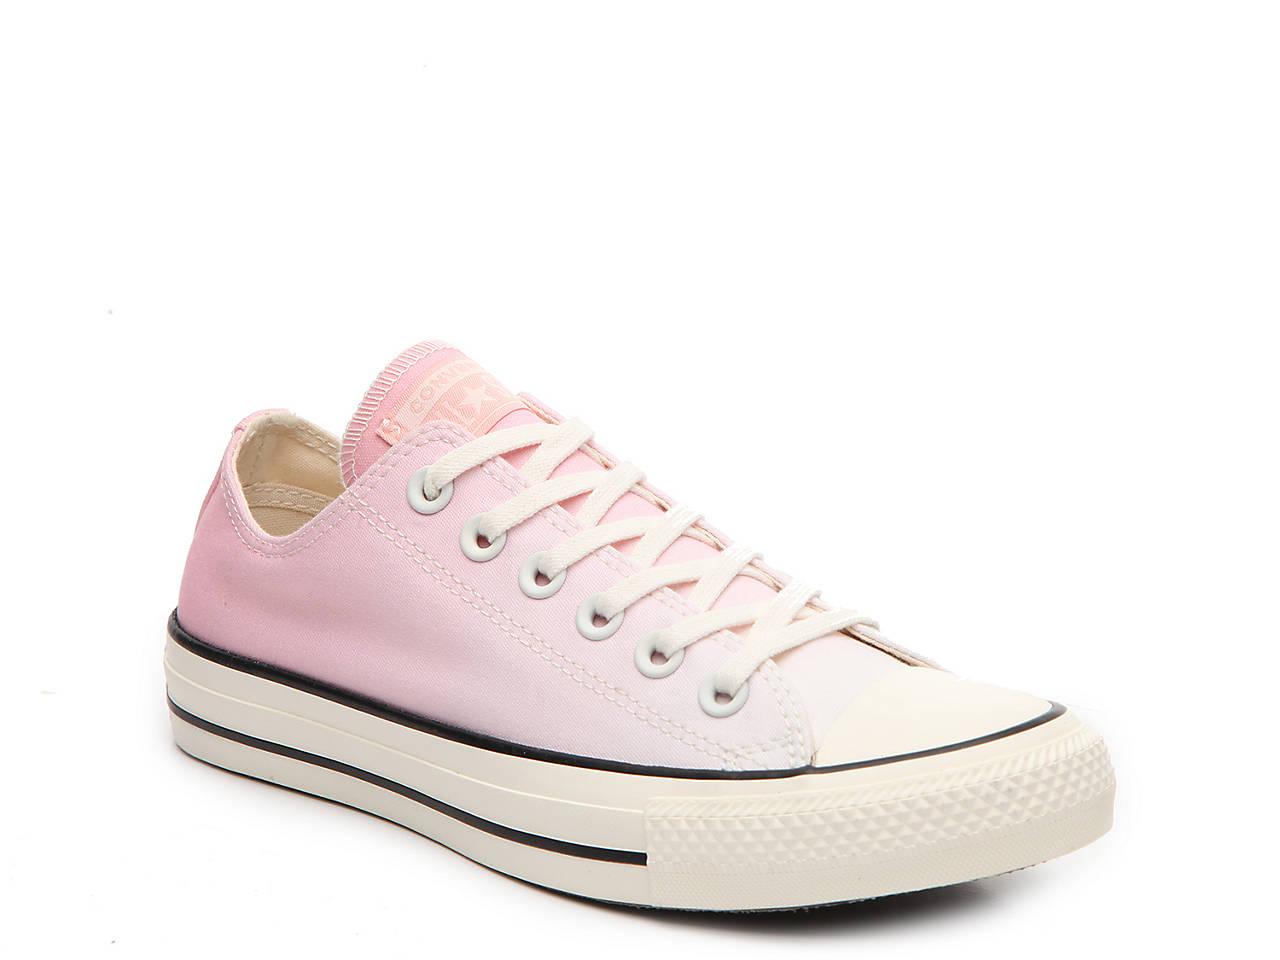 cfbac30374a3 Converse Chuck Taylor All Star Storm Sneaker - Women s Women s Shoes ...